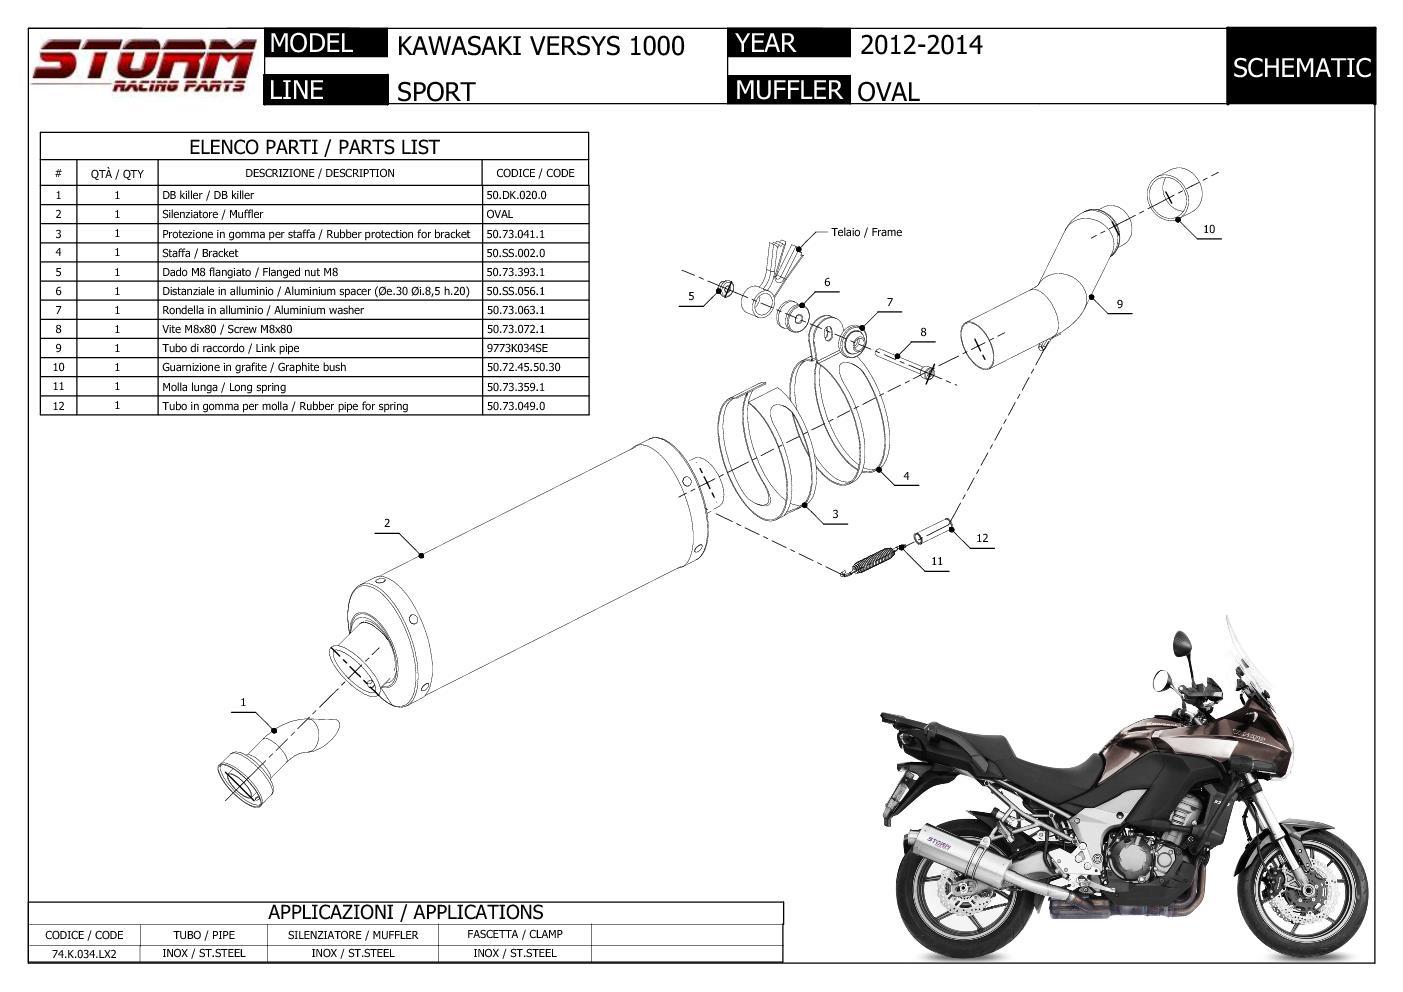 Exhaust Storm by Mivv Muffler Oval Steel for Kawasaki